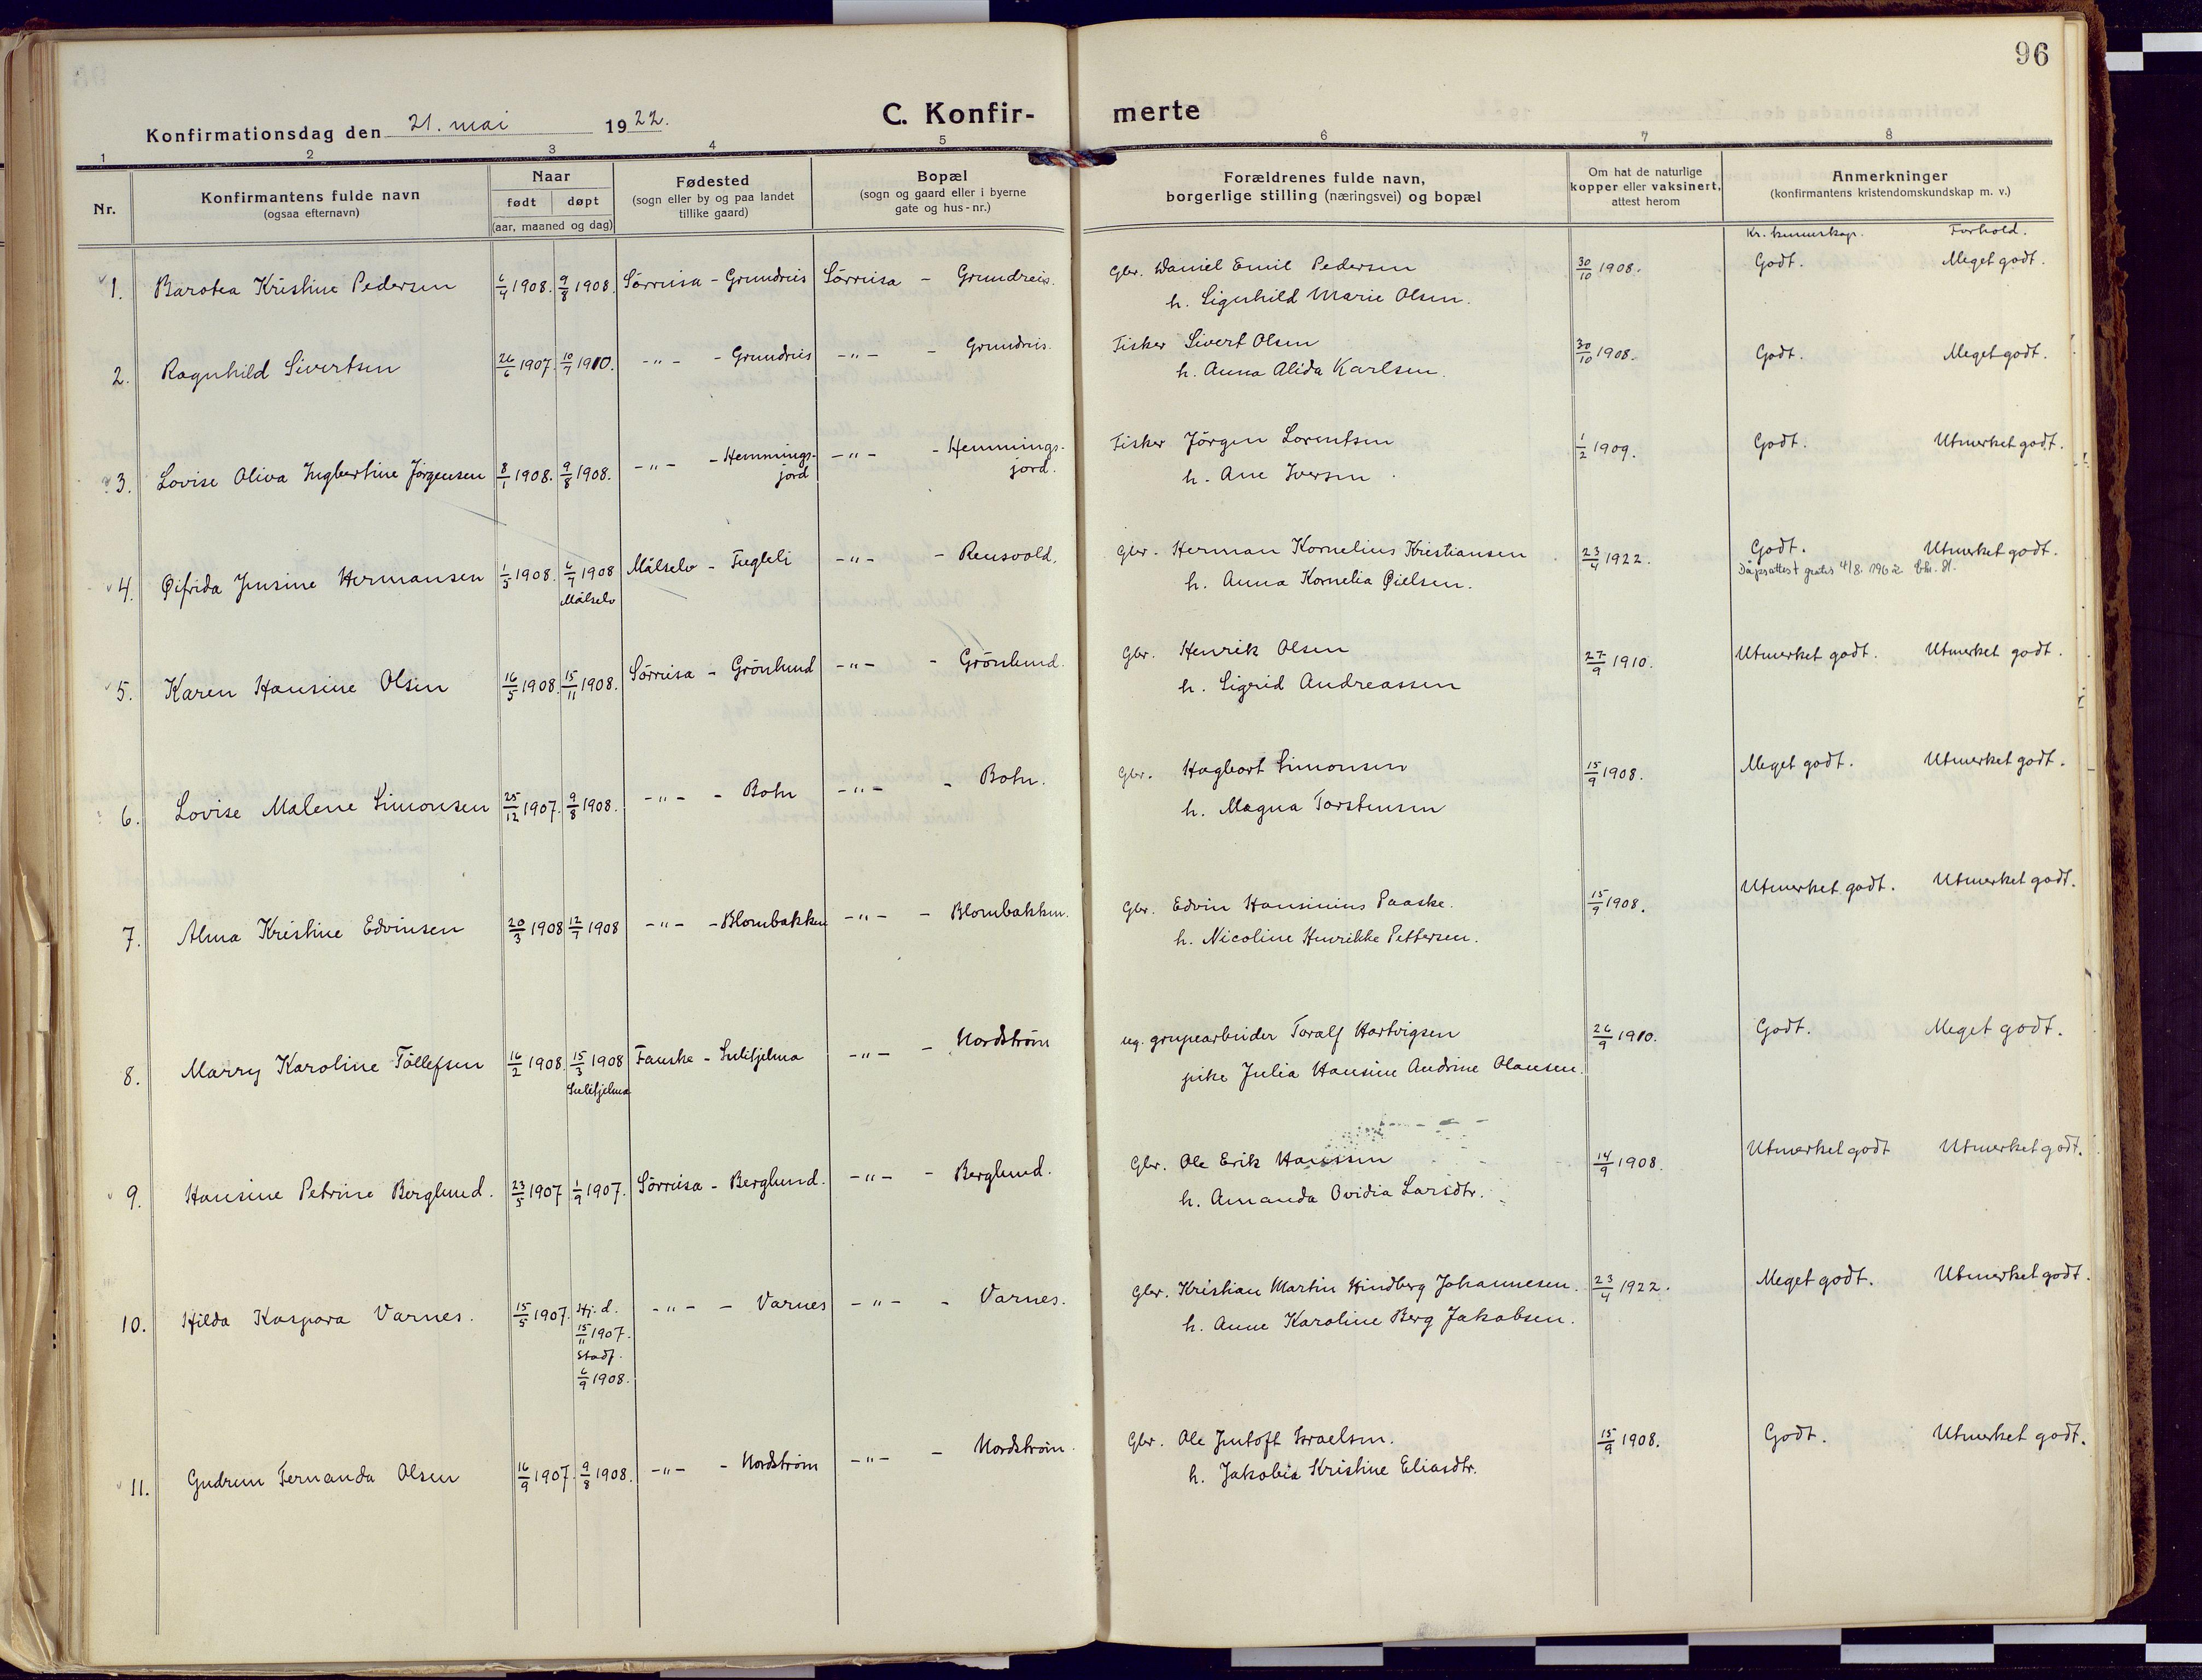 SATØ, Tranøy sokneprestkontor, I/Ia/Iaa/L0015kirke: Ministerialbok nr. 15, 1919-1928, s. 96